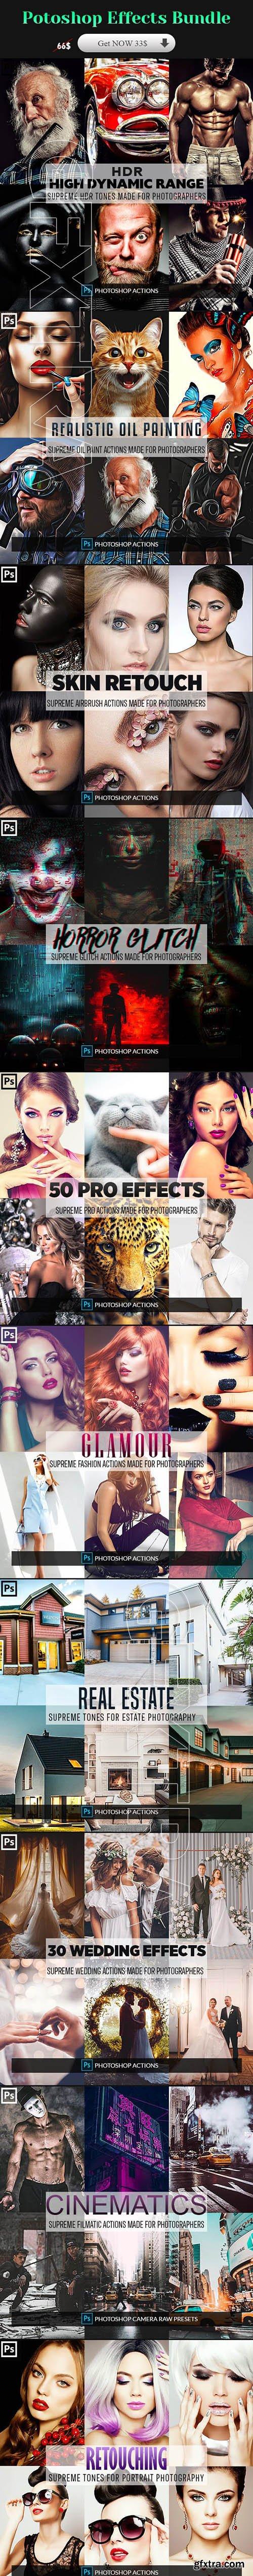 GraphicRiver - Photoshop Effects Bundle 23634769